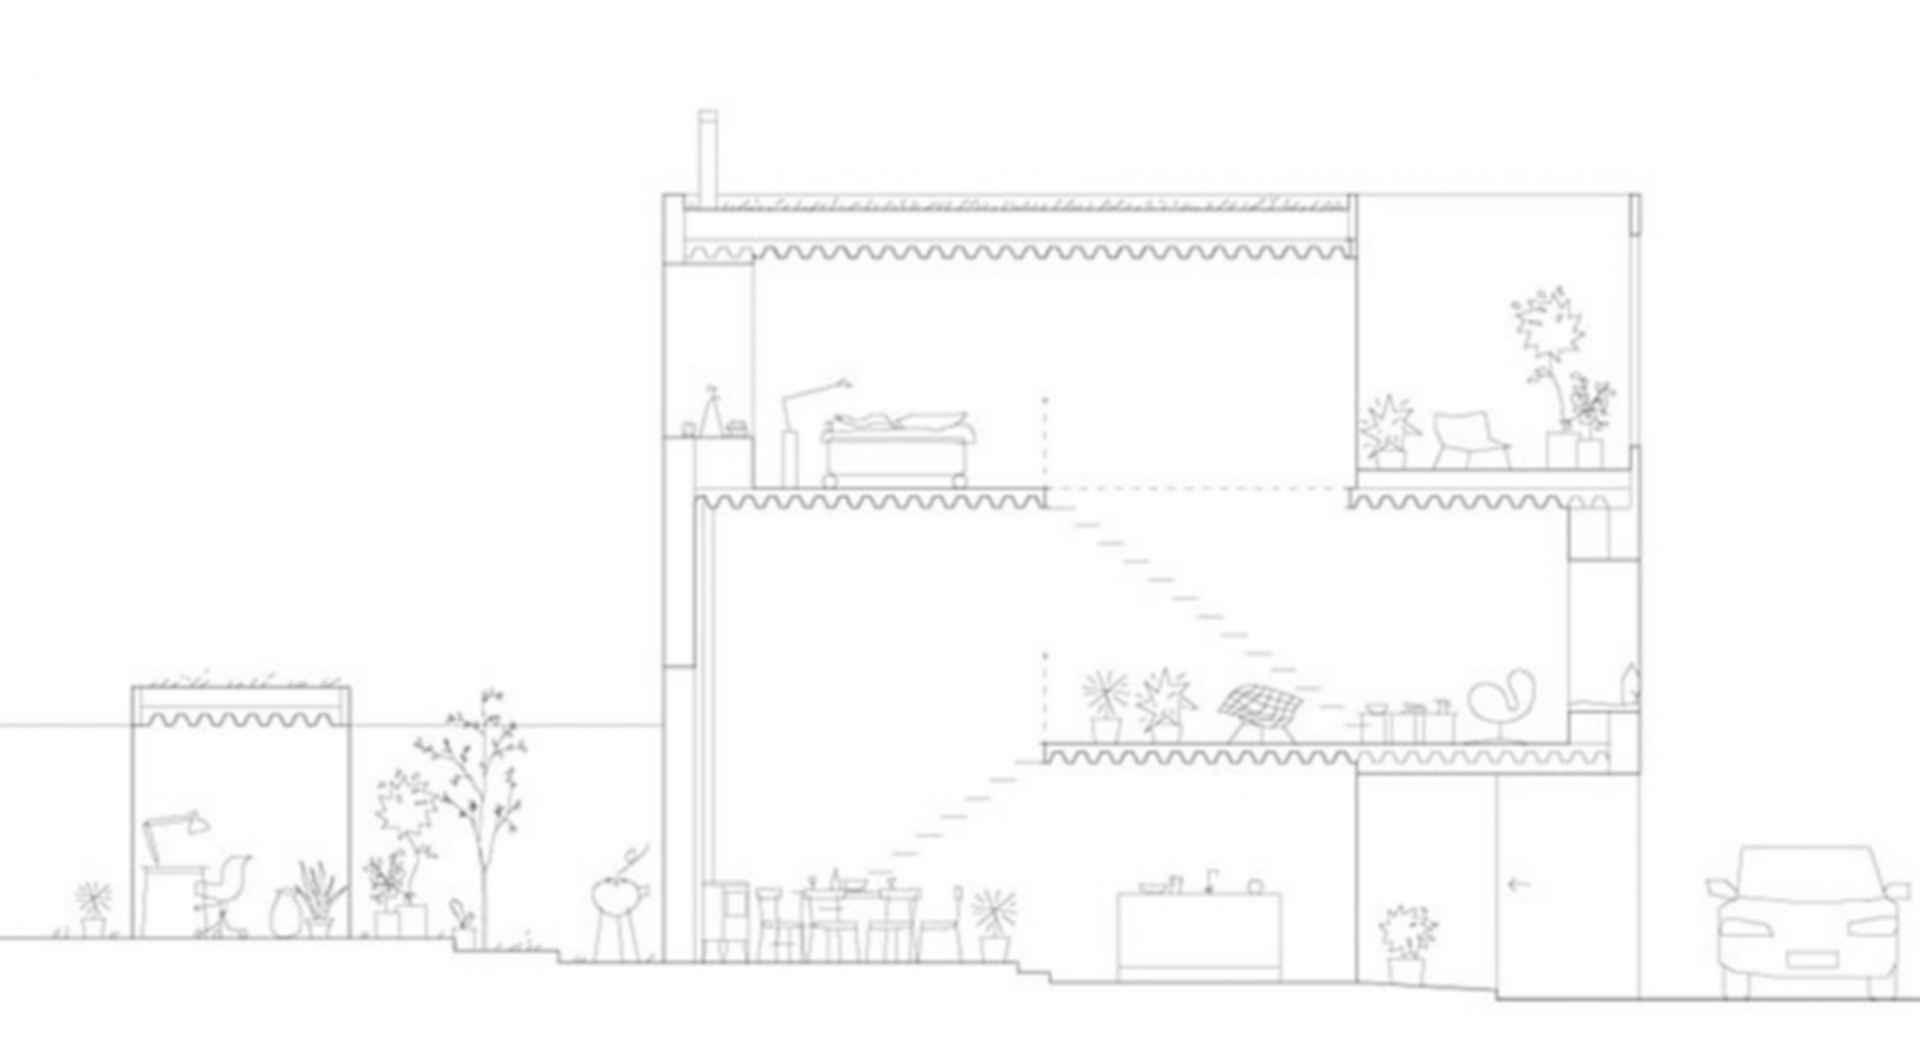 Townhouse - floor plan